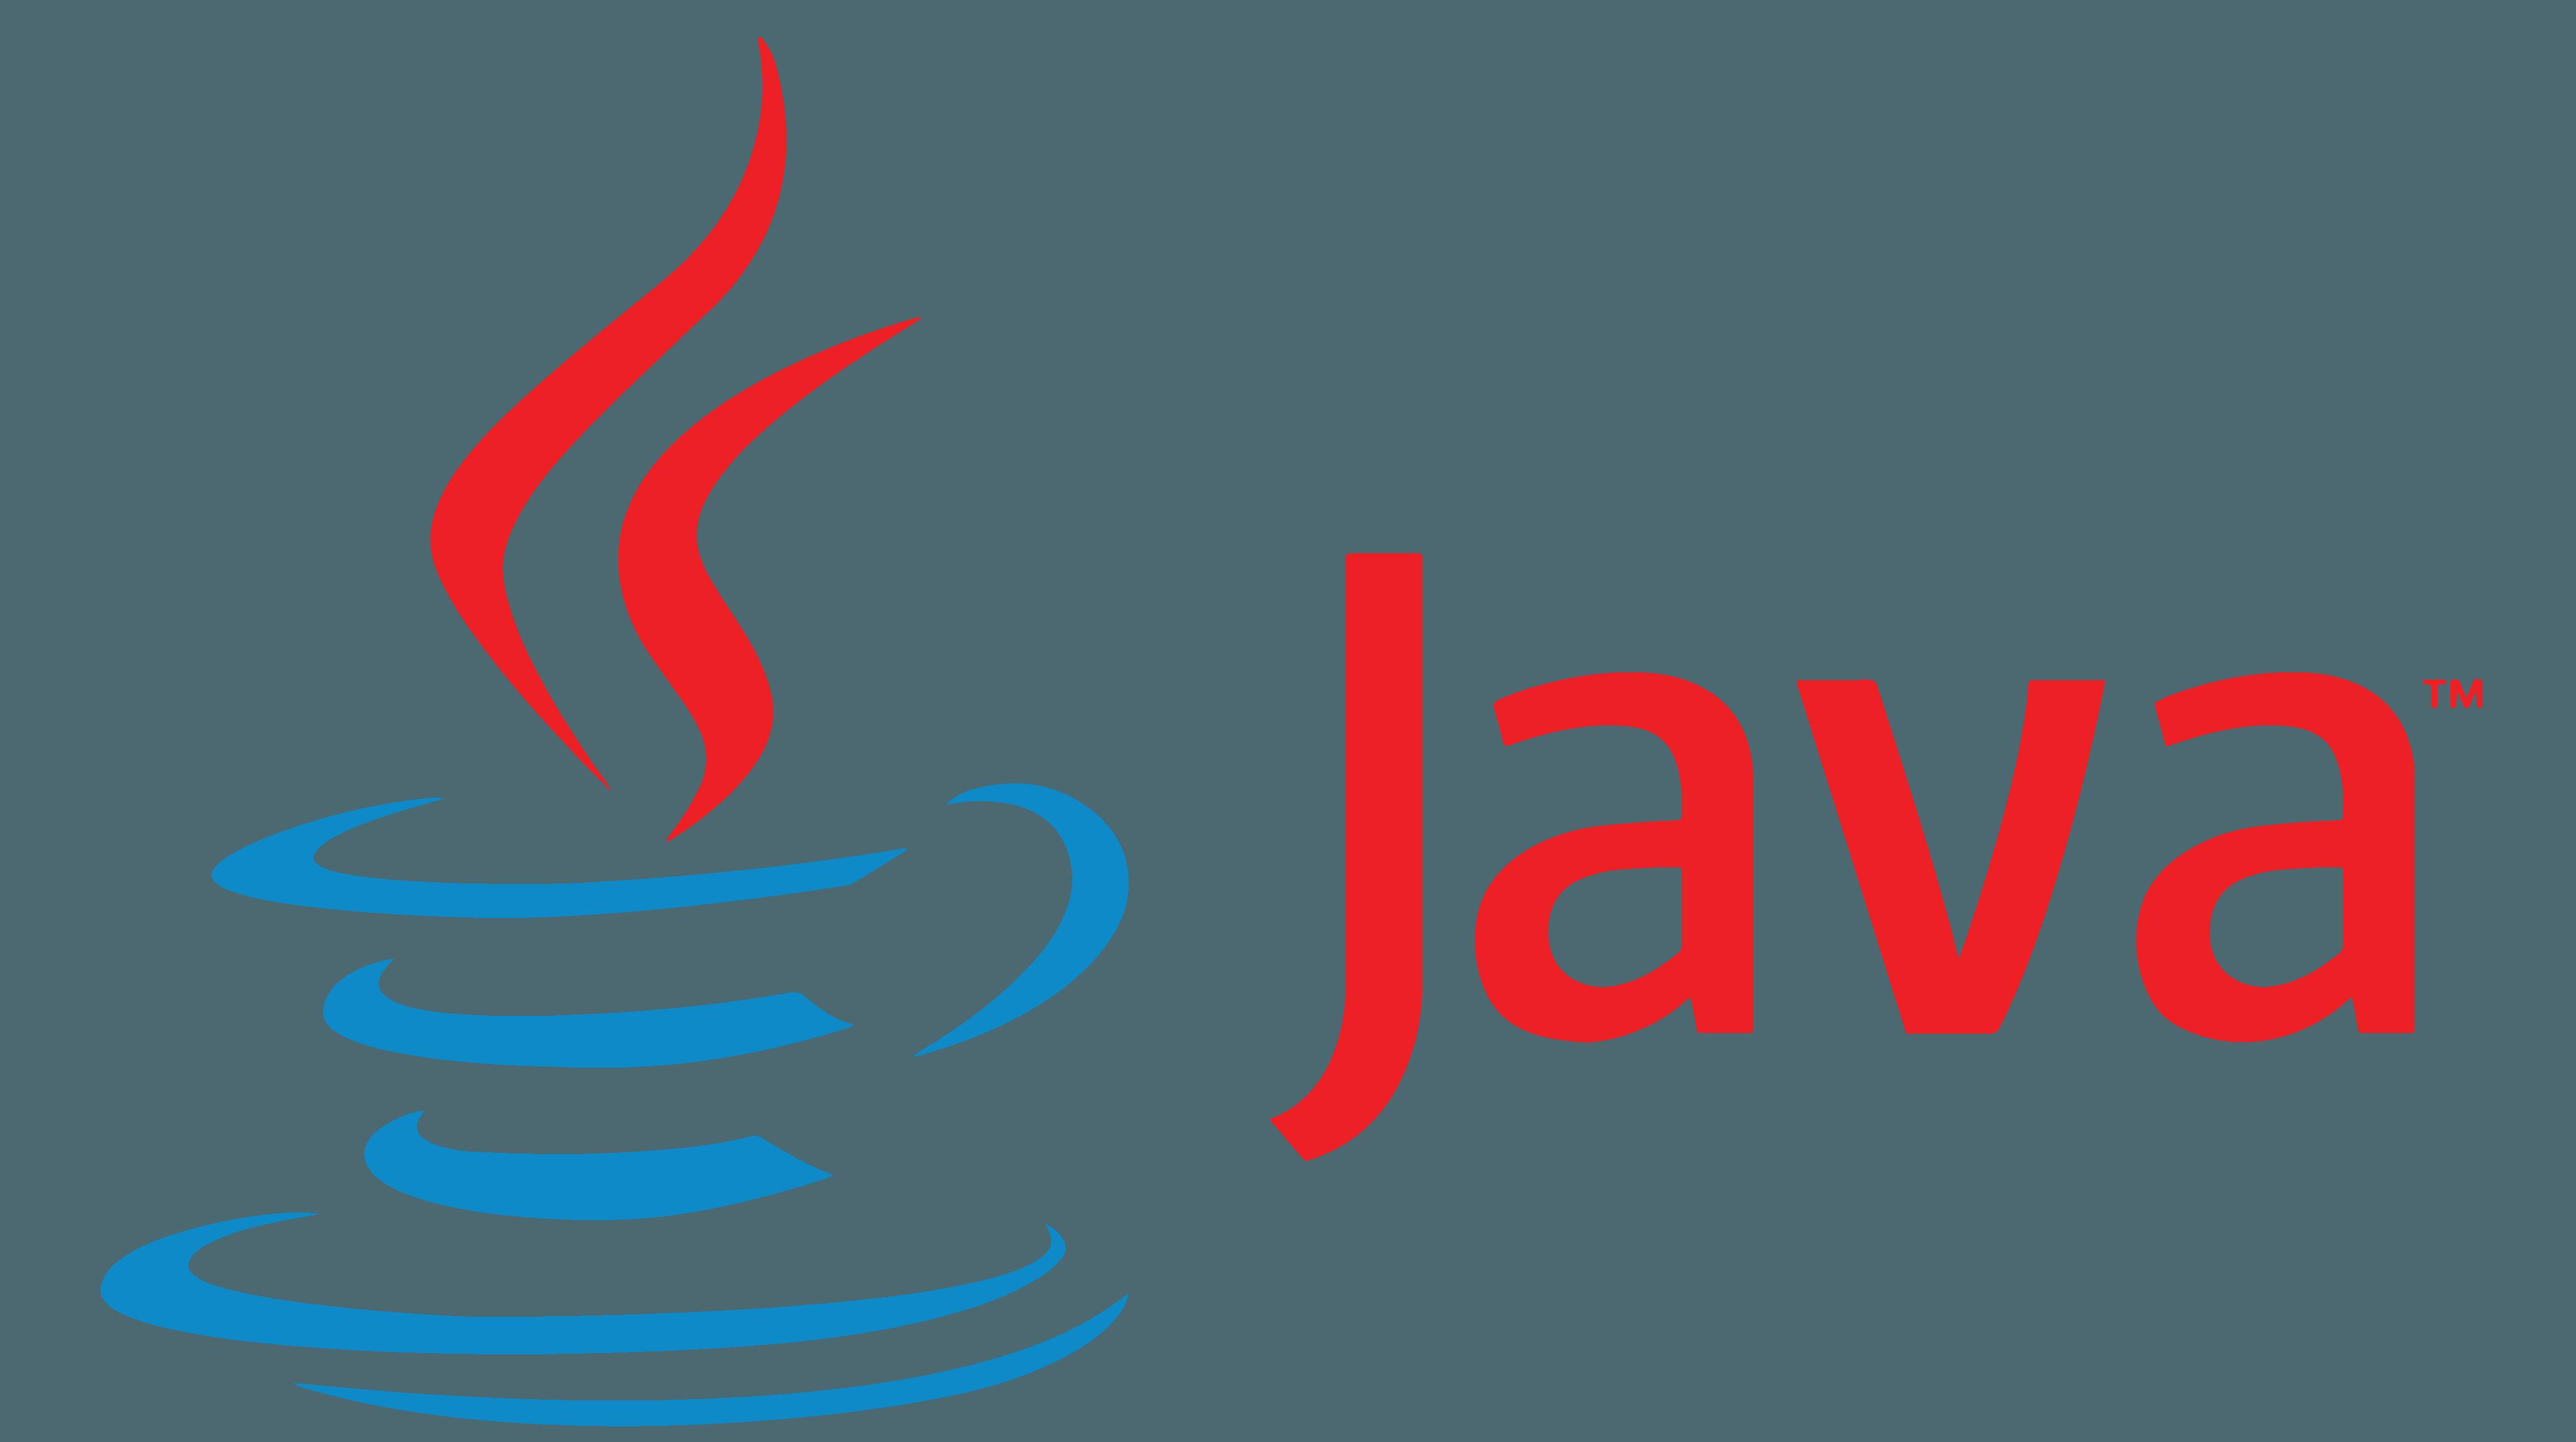 Java-logo icon